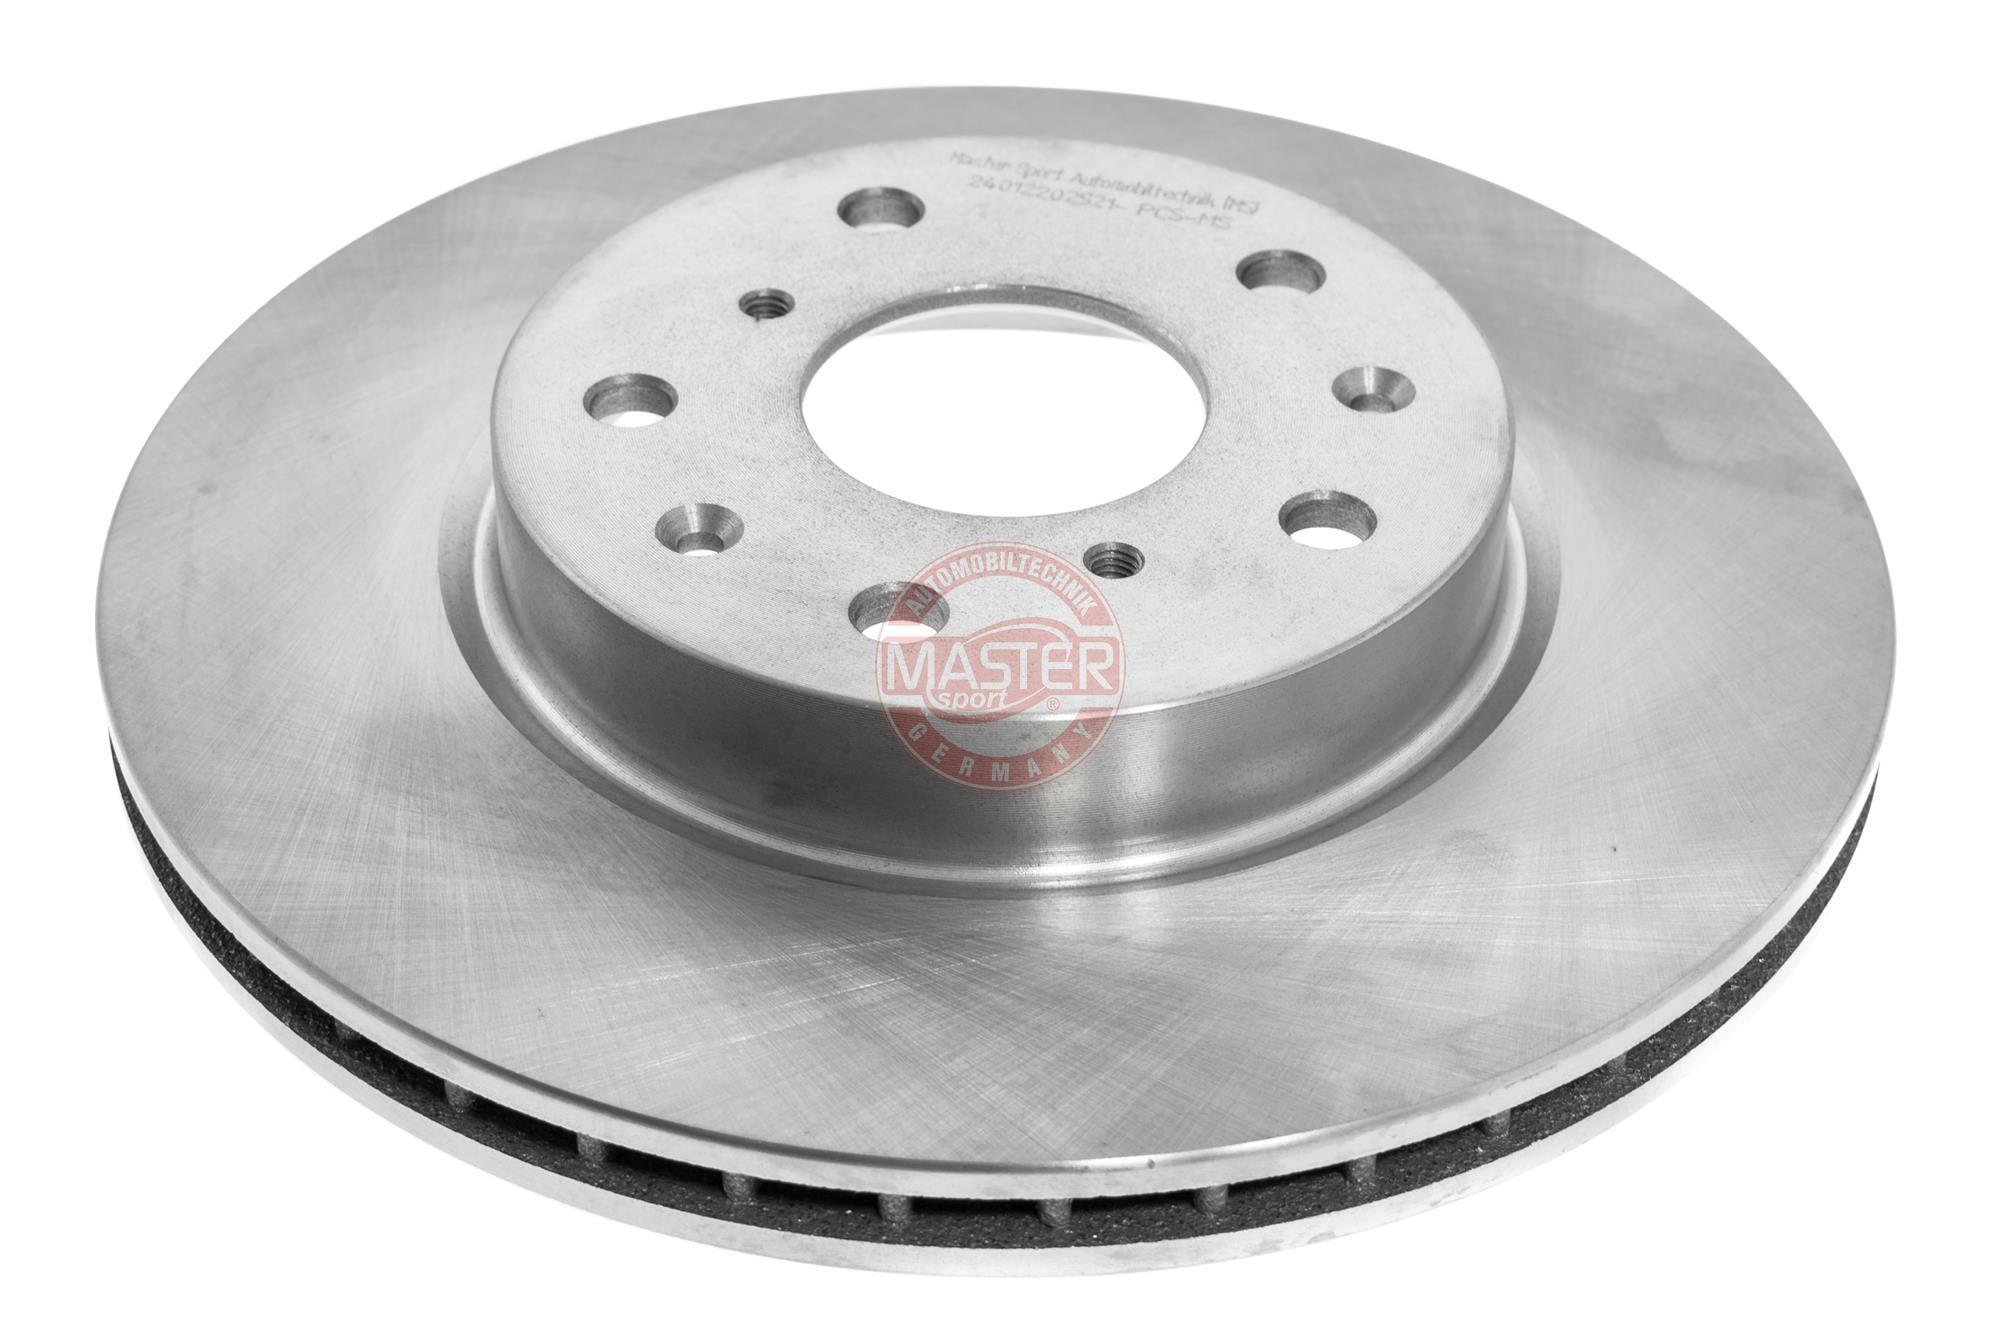 Bremsscheibe MASTER-SPORT 24012202521-PCS-MS Bewertungen